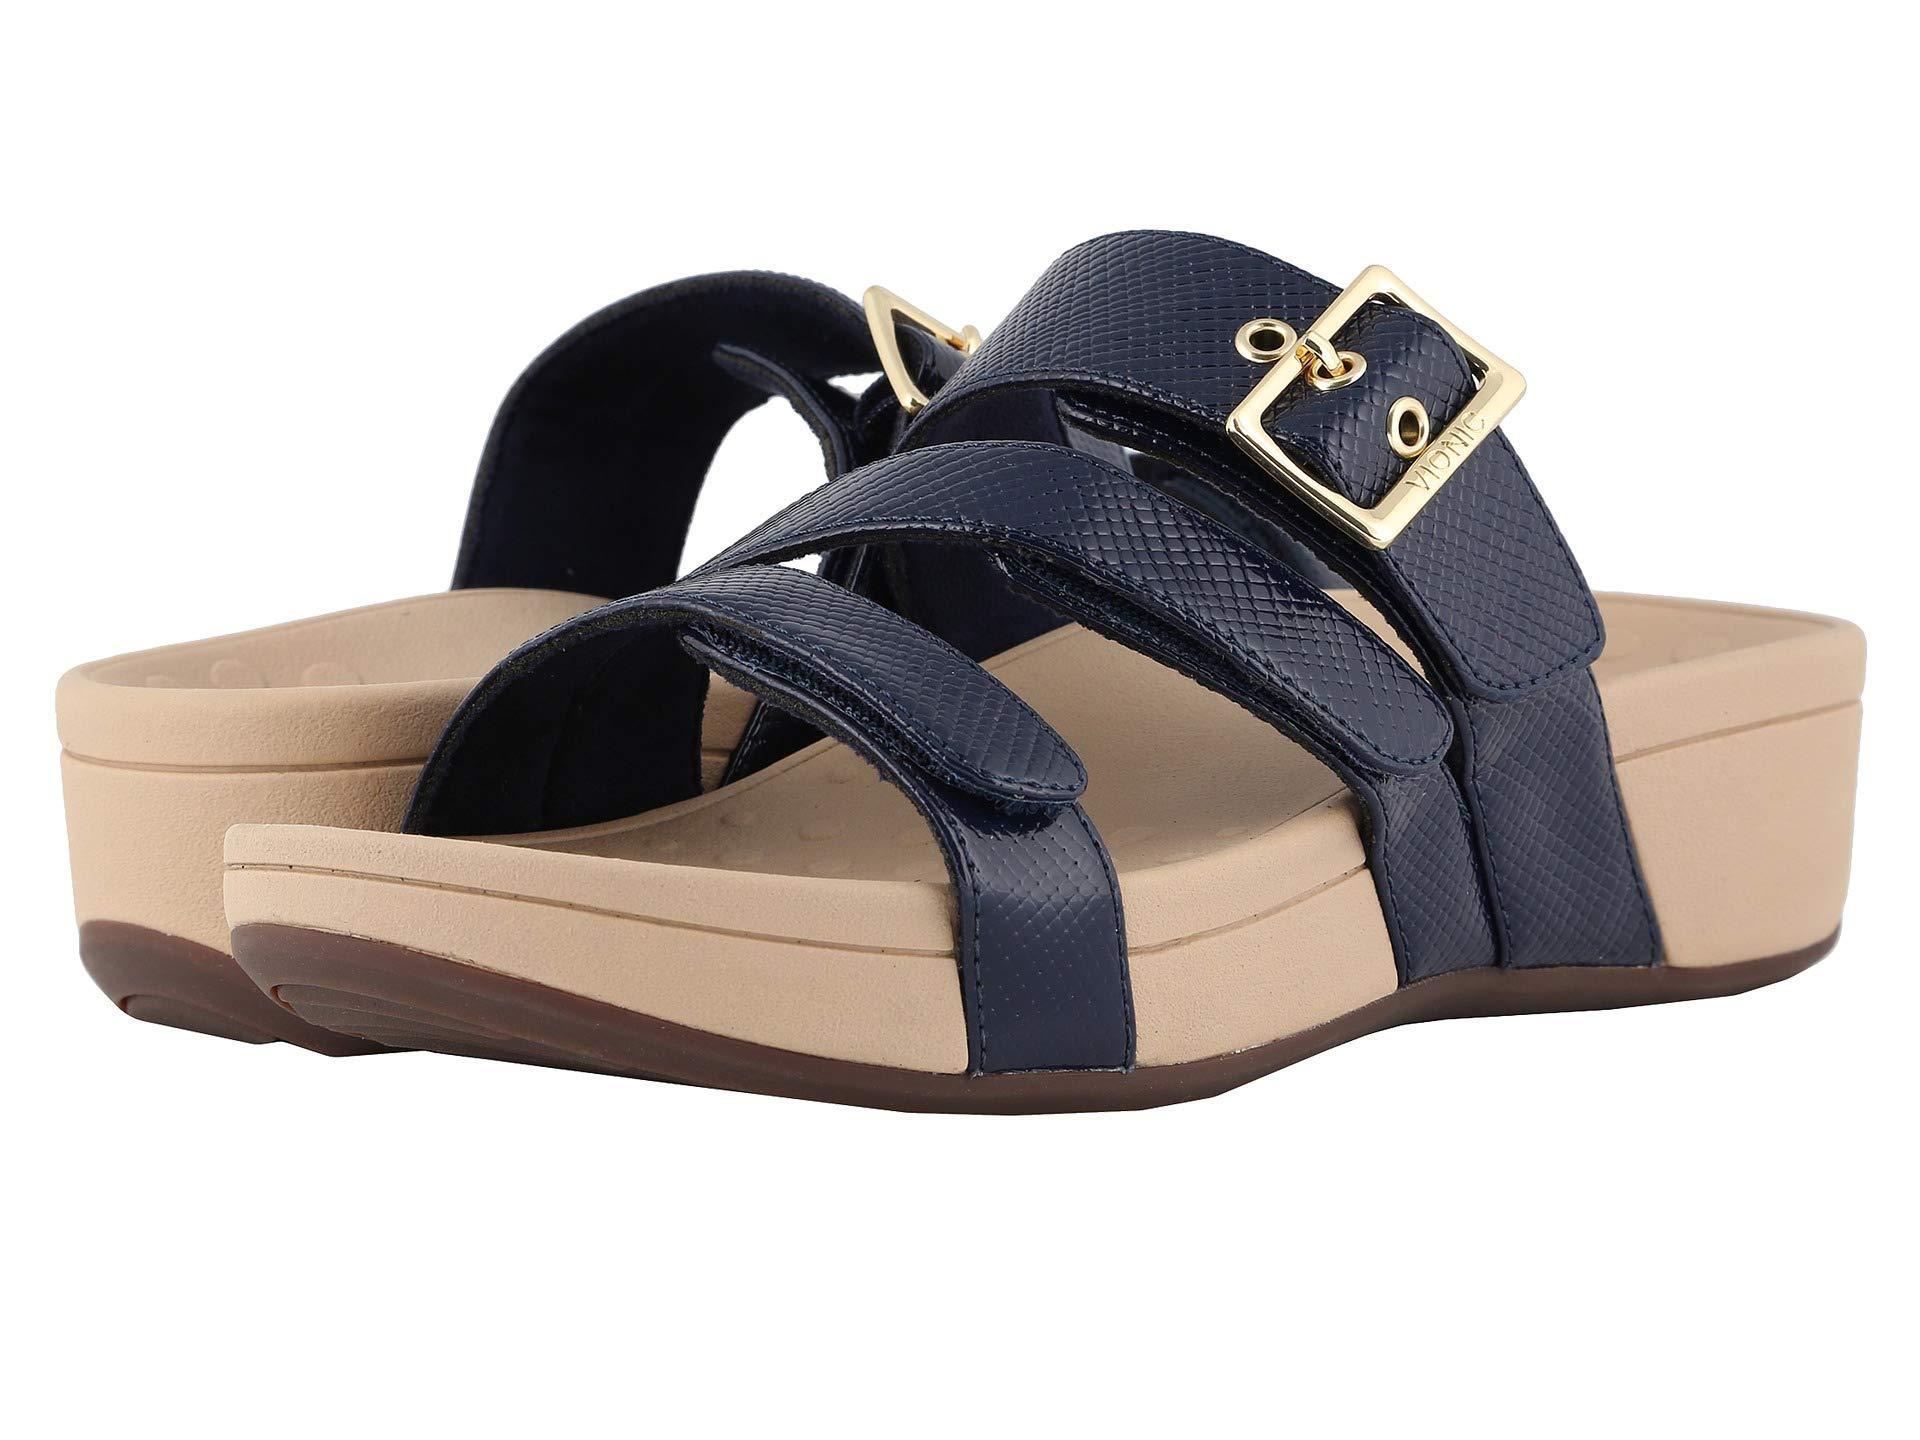 1657c5da4b2e Vionic - Blue Rio Lizard (black) Women s Sandals - Lyst. View fullscreen